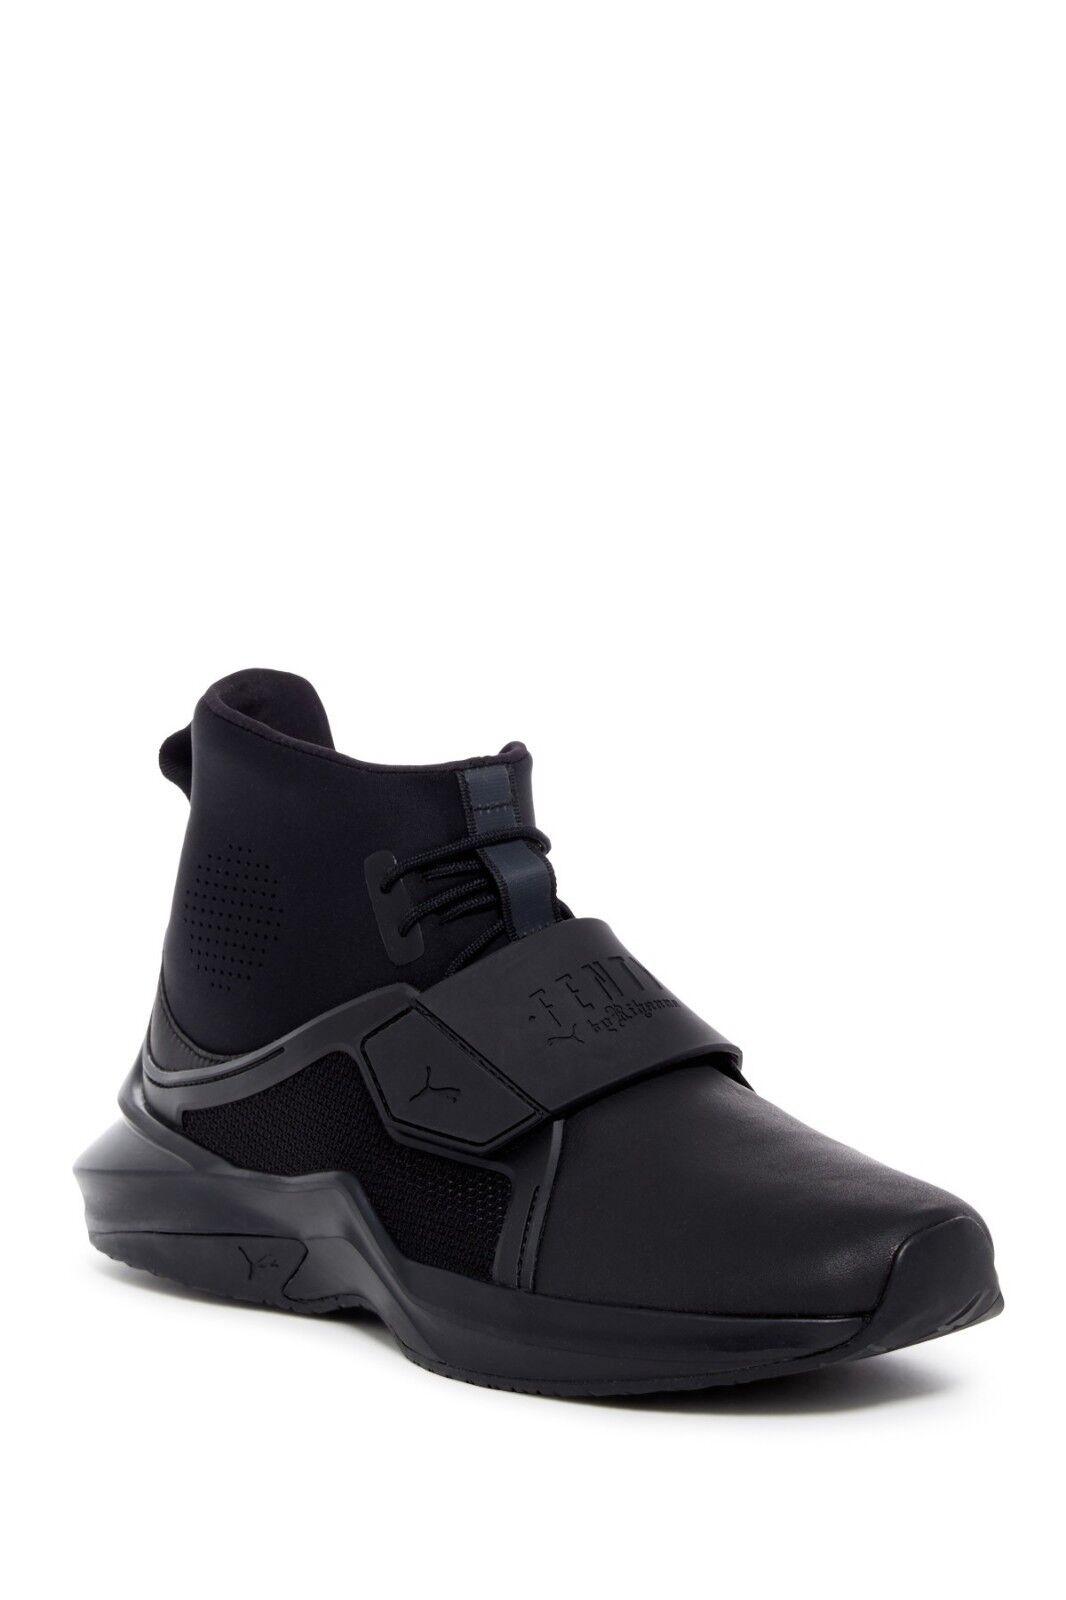 NEW FENTY FENTY PUMA by Rihanna Hi Trainer Sneaker BLACK  190 SZ 8